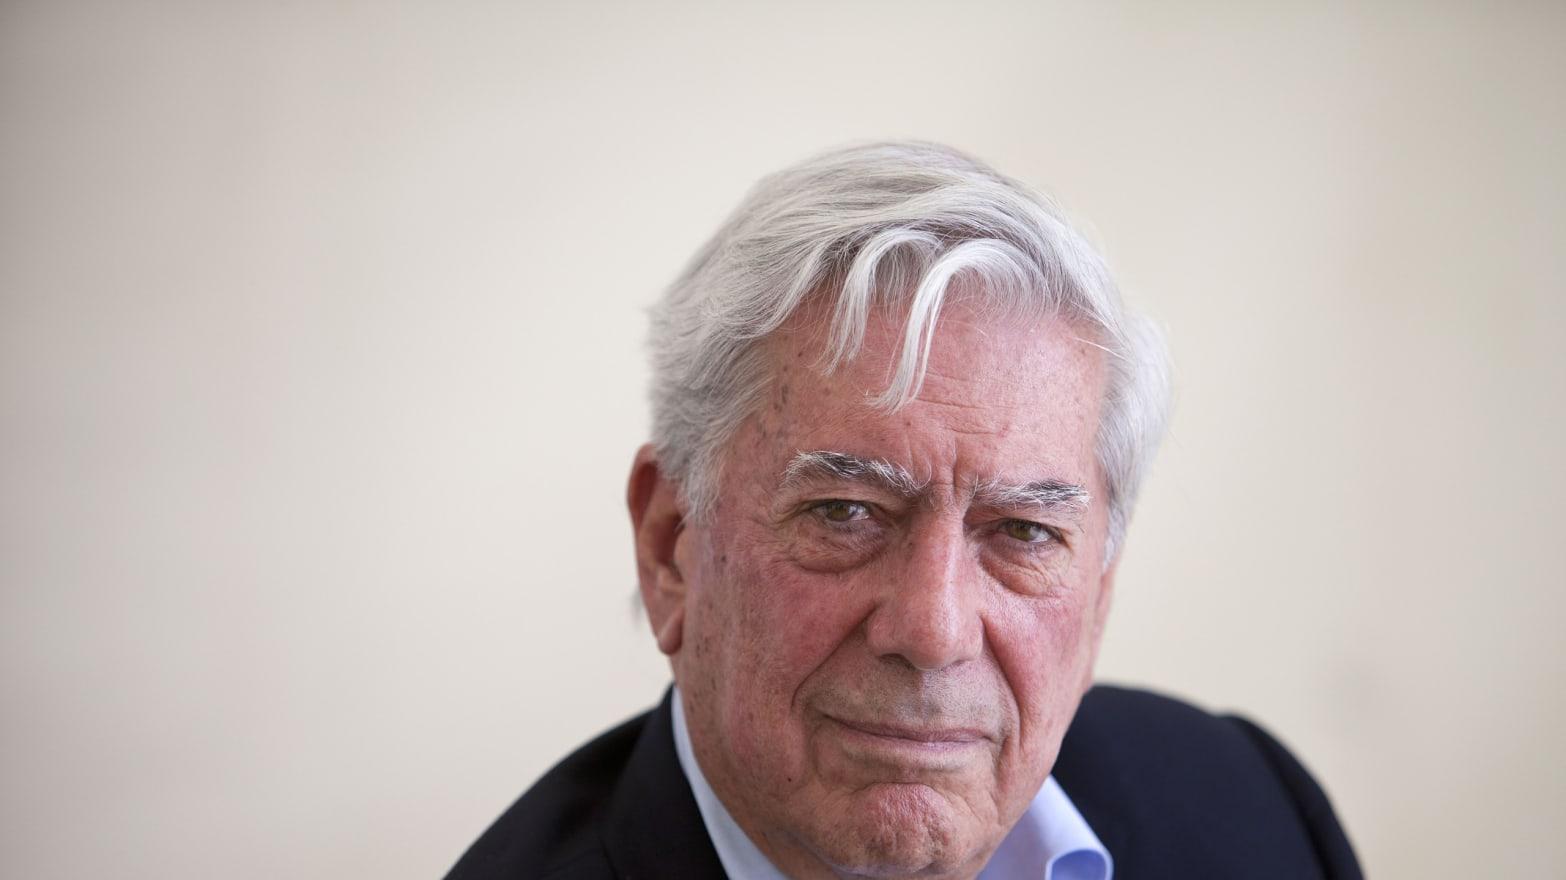 The Politics of Literature: An interview with Nobel laureate Mario Vargas Llosa